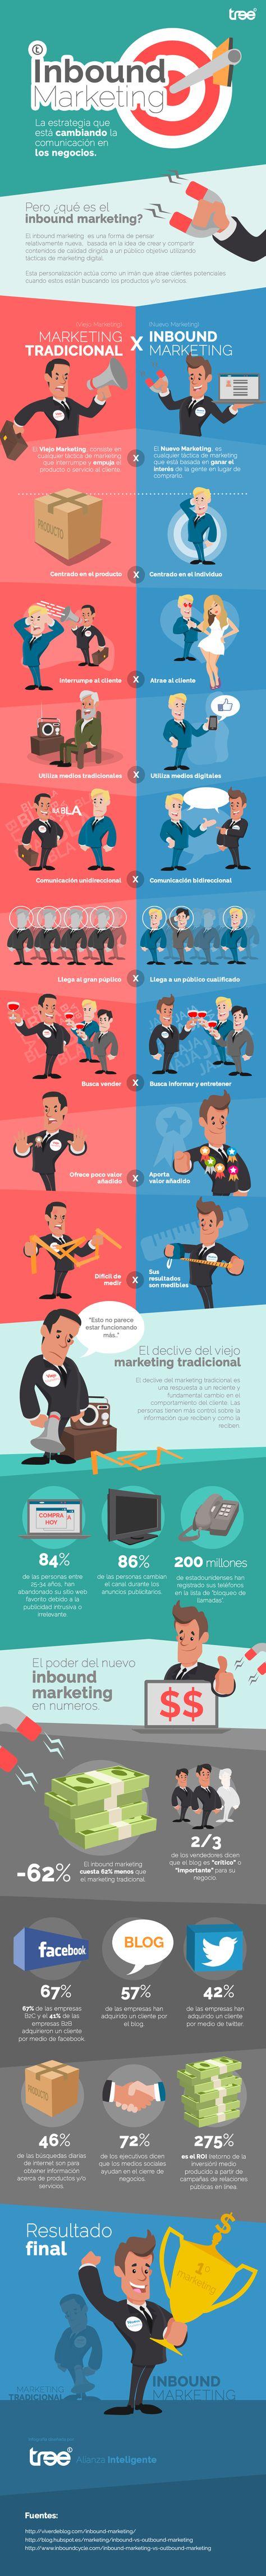 Inbound Marketing vs Marketing tradicional #infografia cc @anlsm30